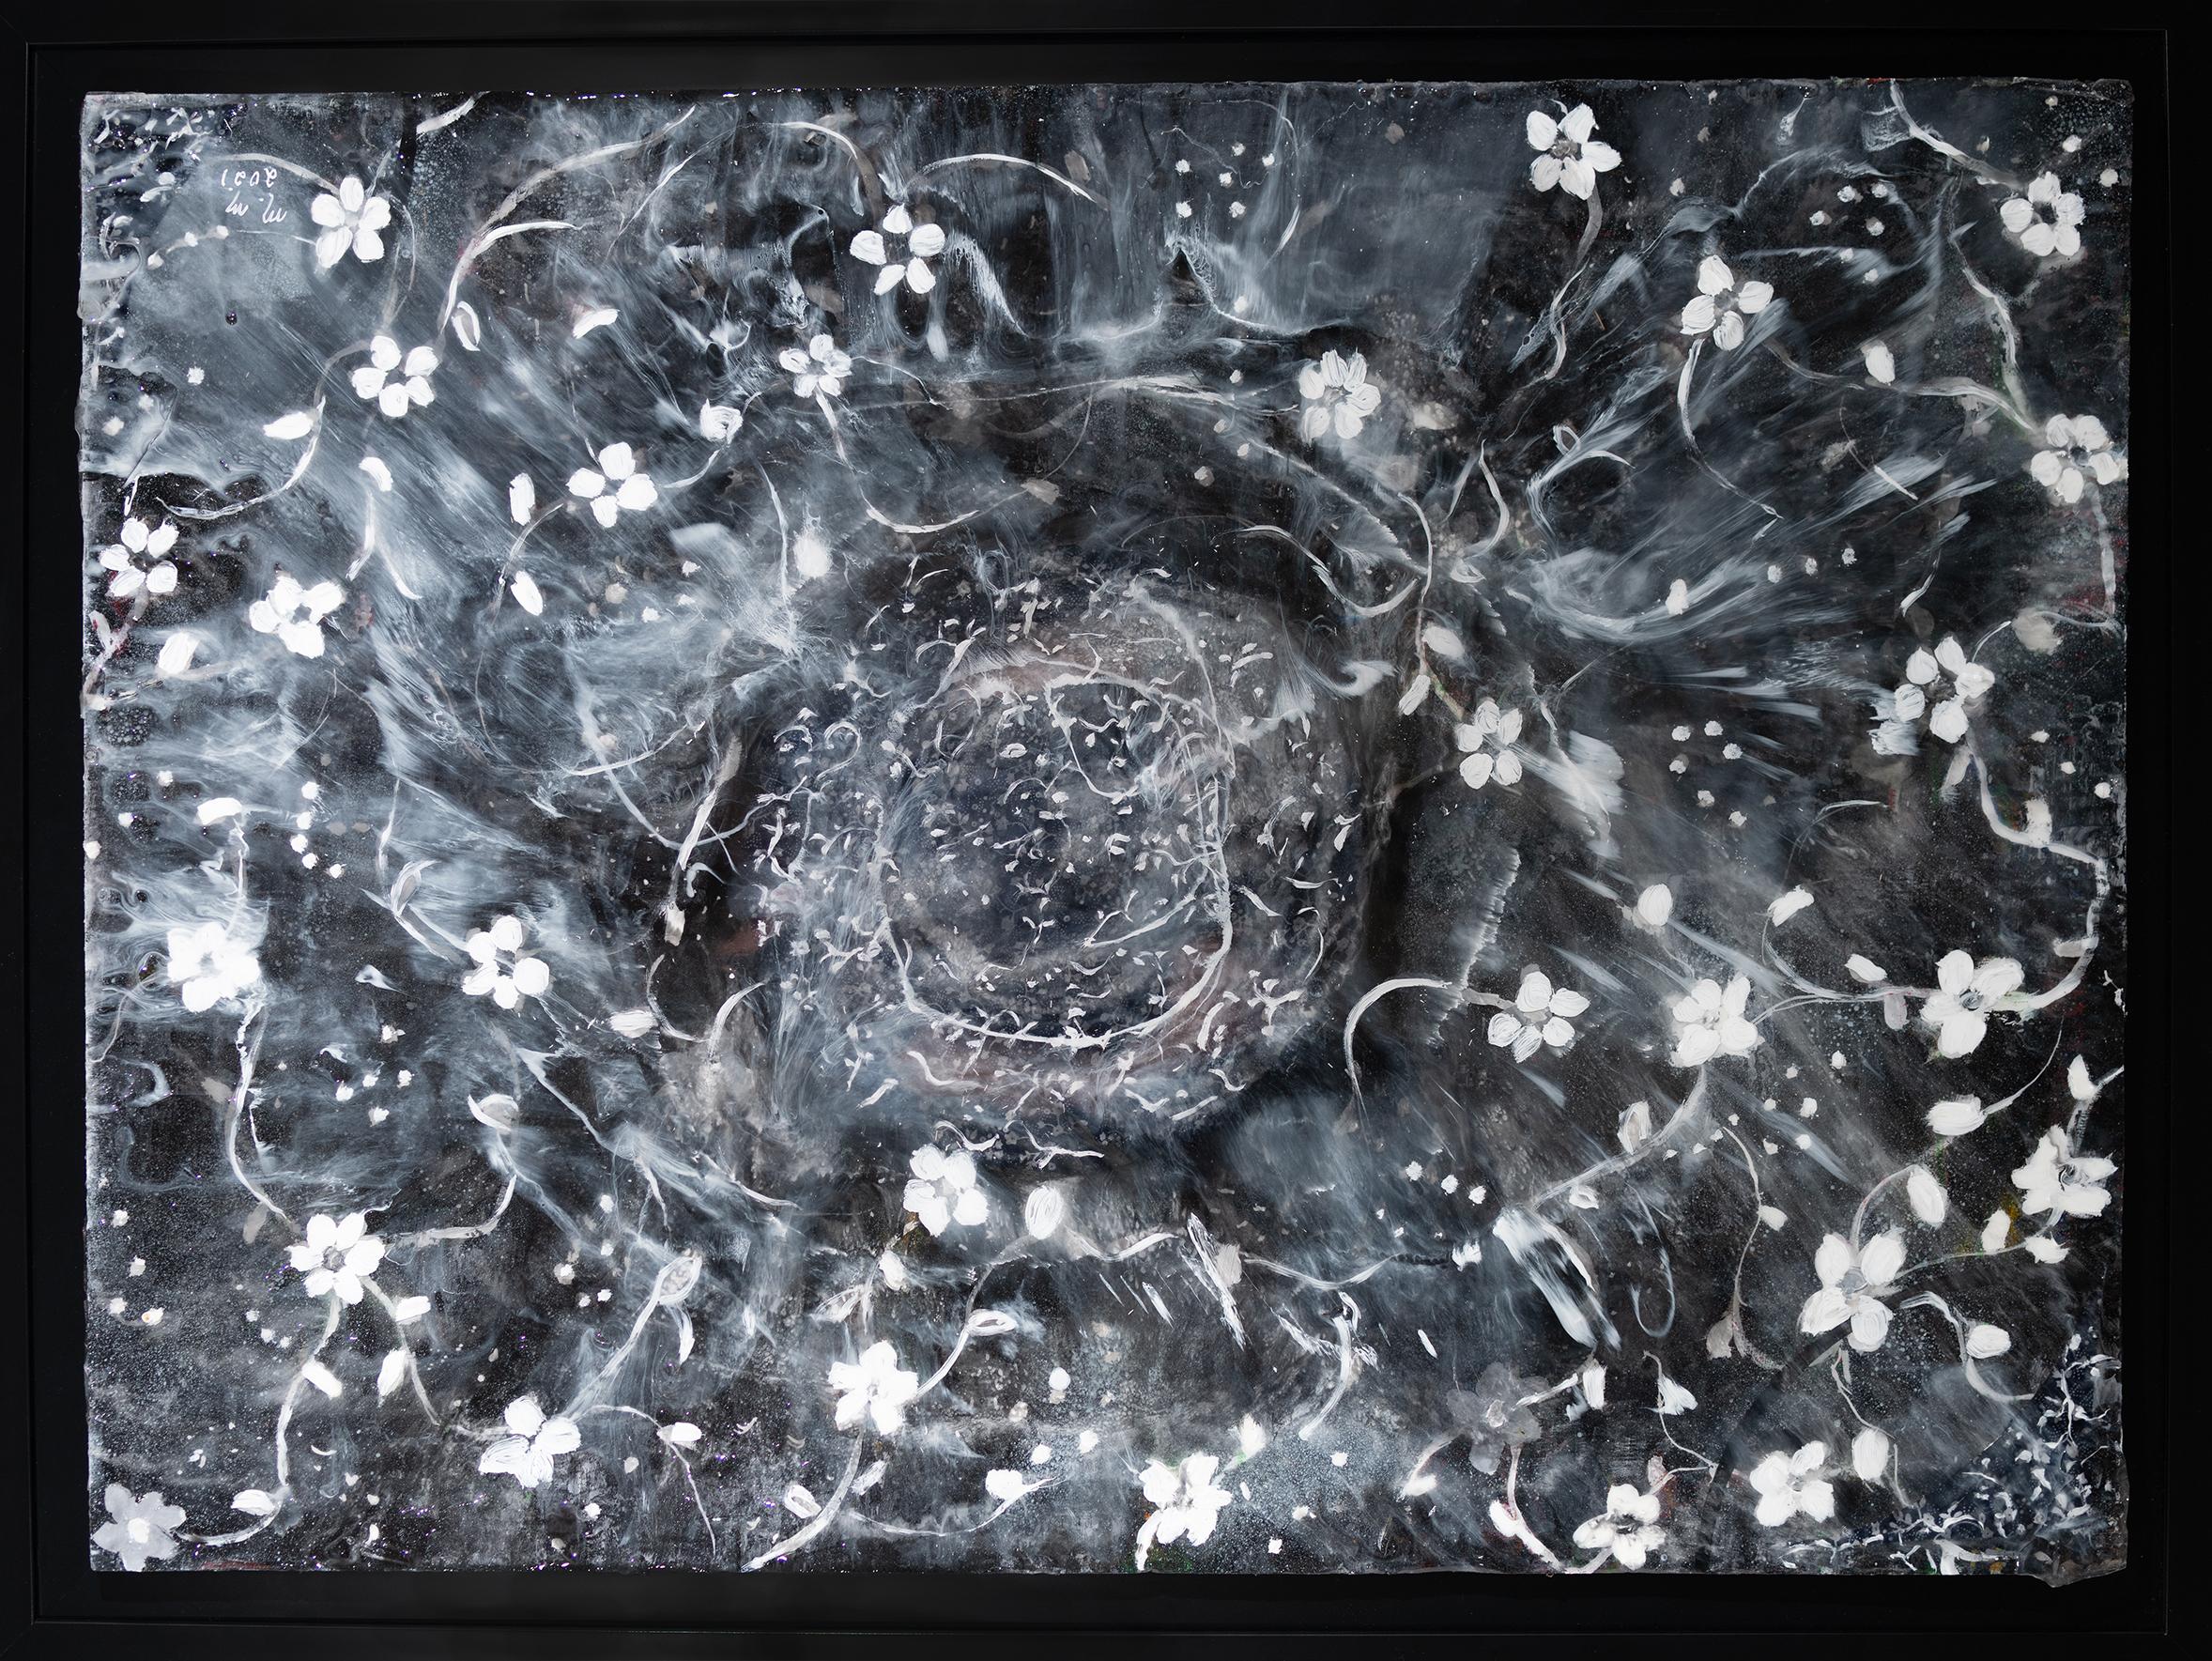 "Circle of Life Black - 23"" x 31.5"" - Mix Media on Cardboard"